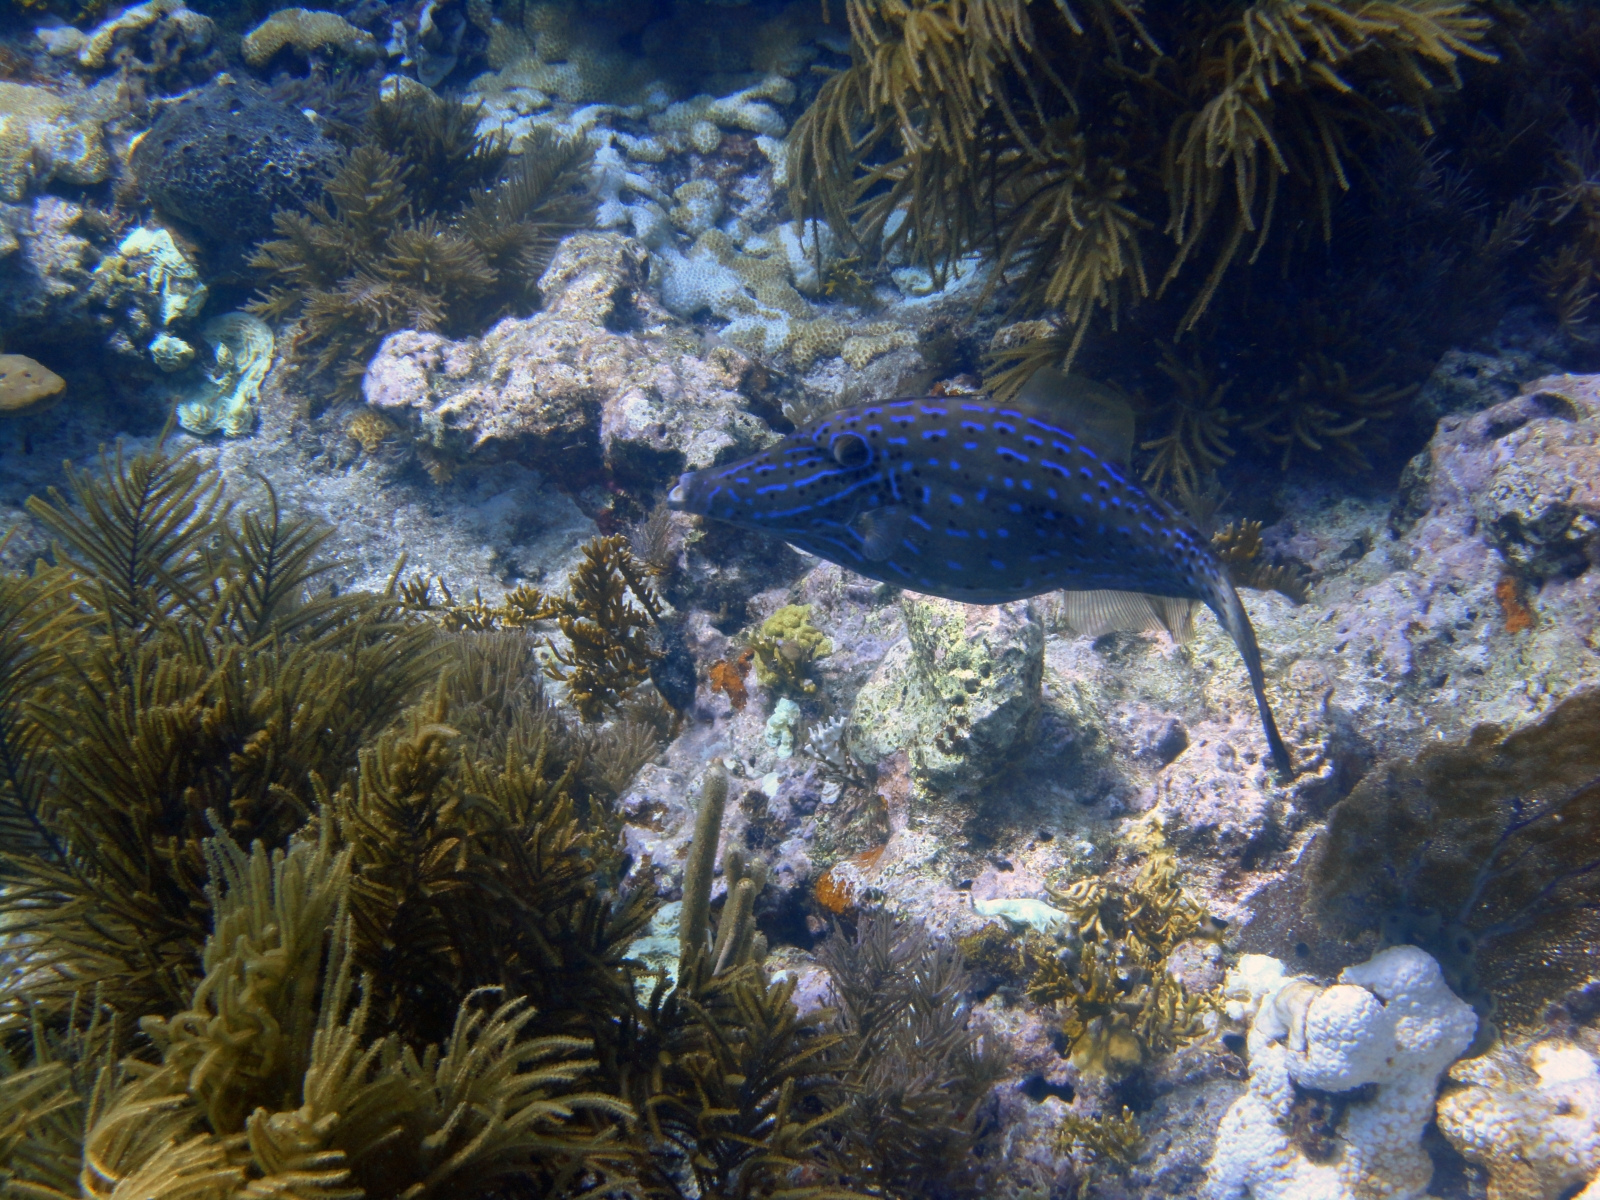 Aluterus_scriptus_002_C_Tetraodontiformes_L_Gran-Barrera-de-Coral_U_Sebas_04112013